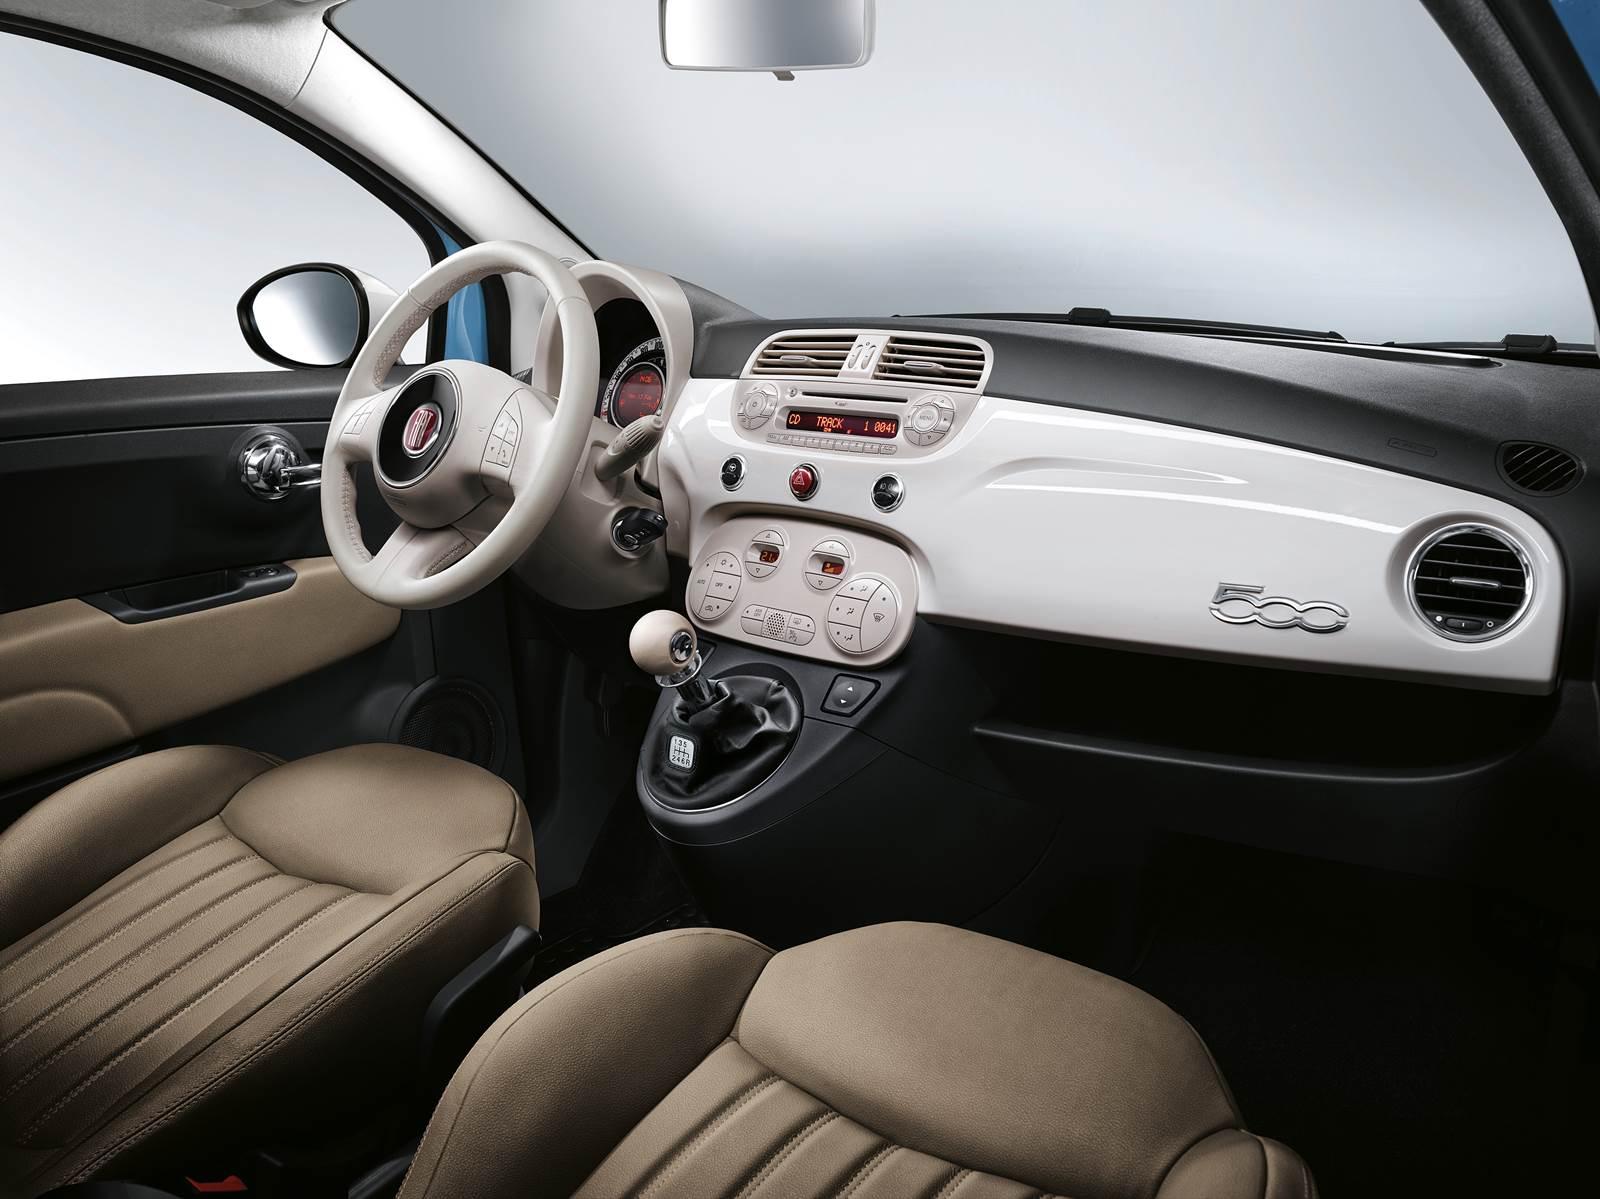 Fiat 500 Vintage '57 - interior